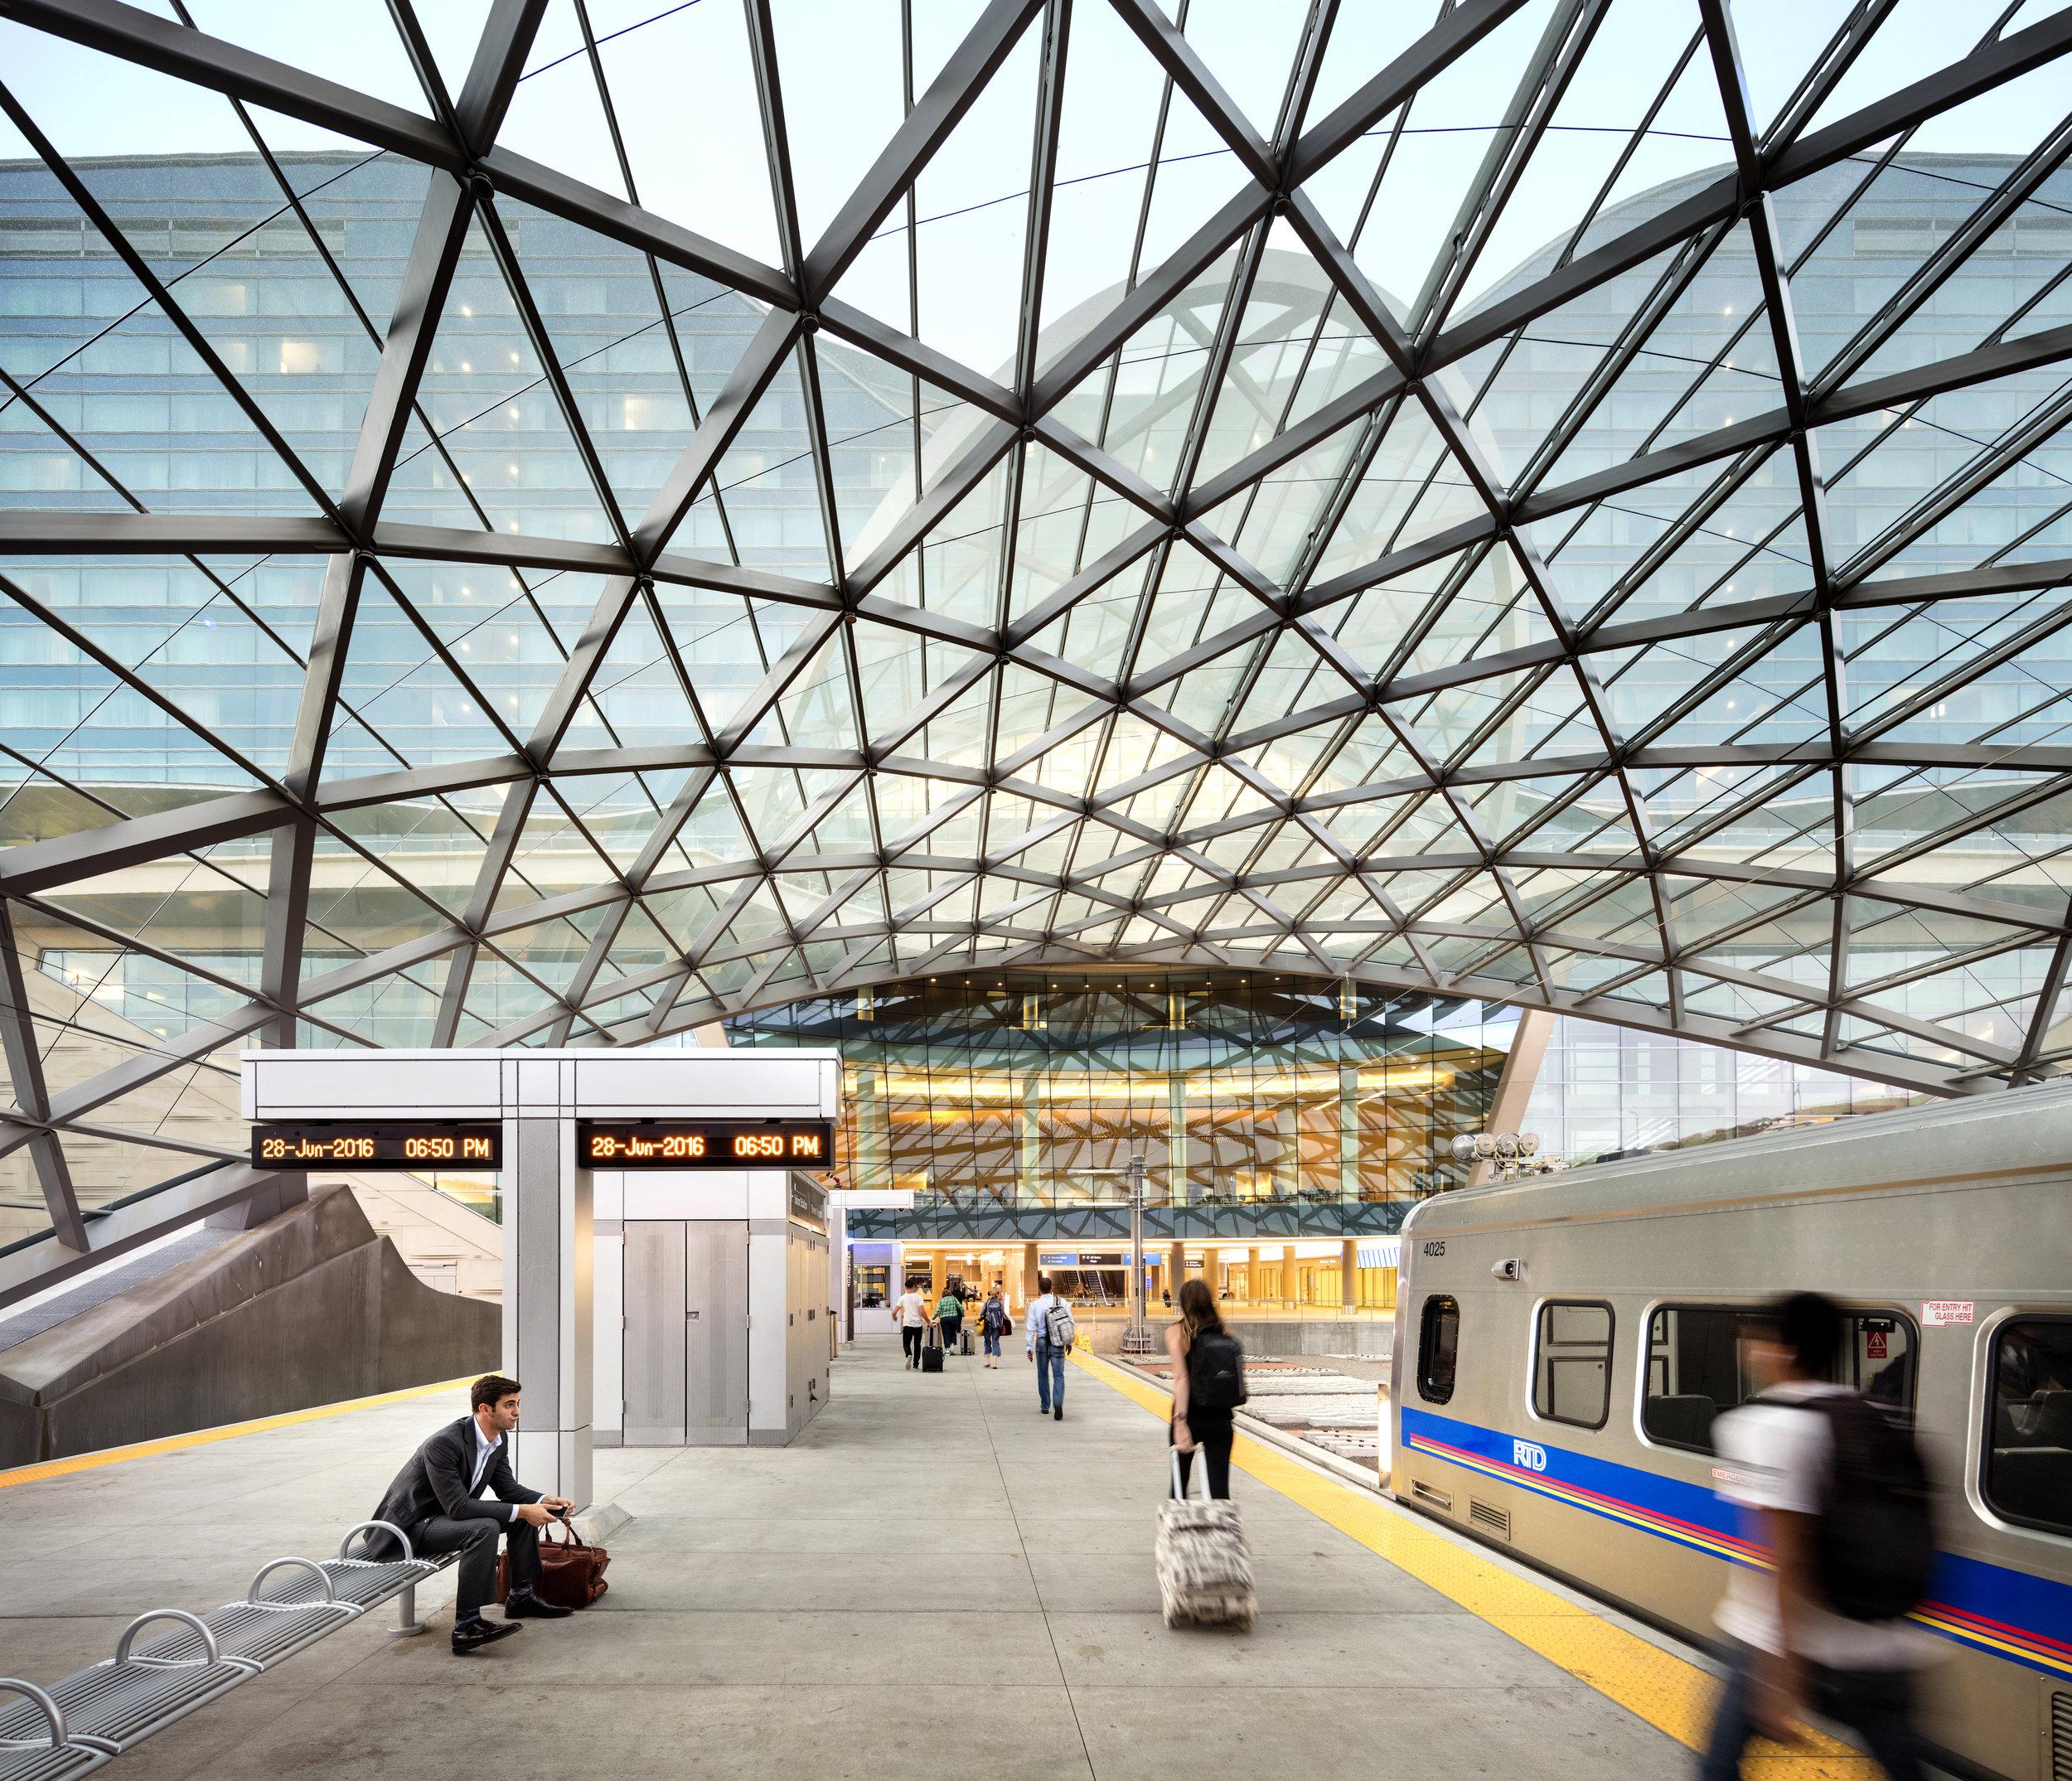 "<img src="" studioINSITE__WestinDEN_Train Terminal ""alt=""Denver International Airport, DIA, Denver, CO, Colorado, Airport, Art, Hotel, Transit, Light Rail, Events, Arts, Sculpture, Plaza, Transportation, Terminal, Hub  ""title=""Denver International Airport - Westin Hotel Plaza  ""/>"